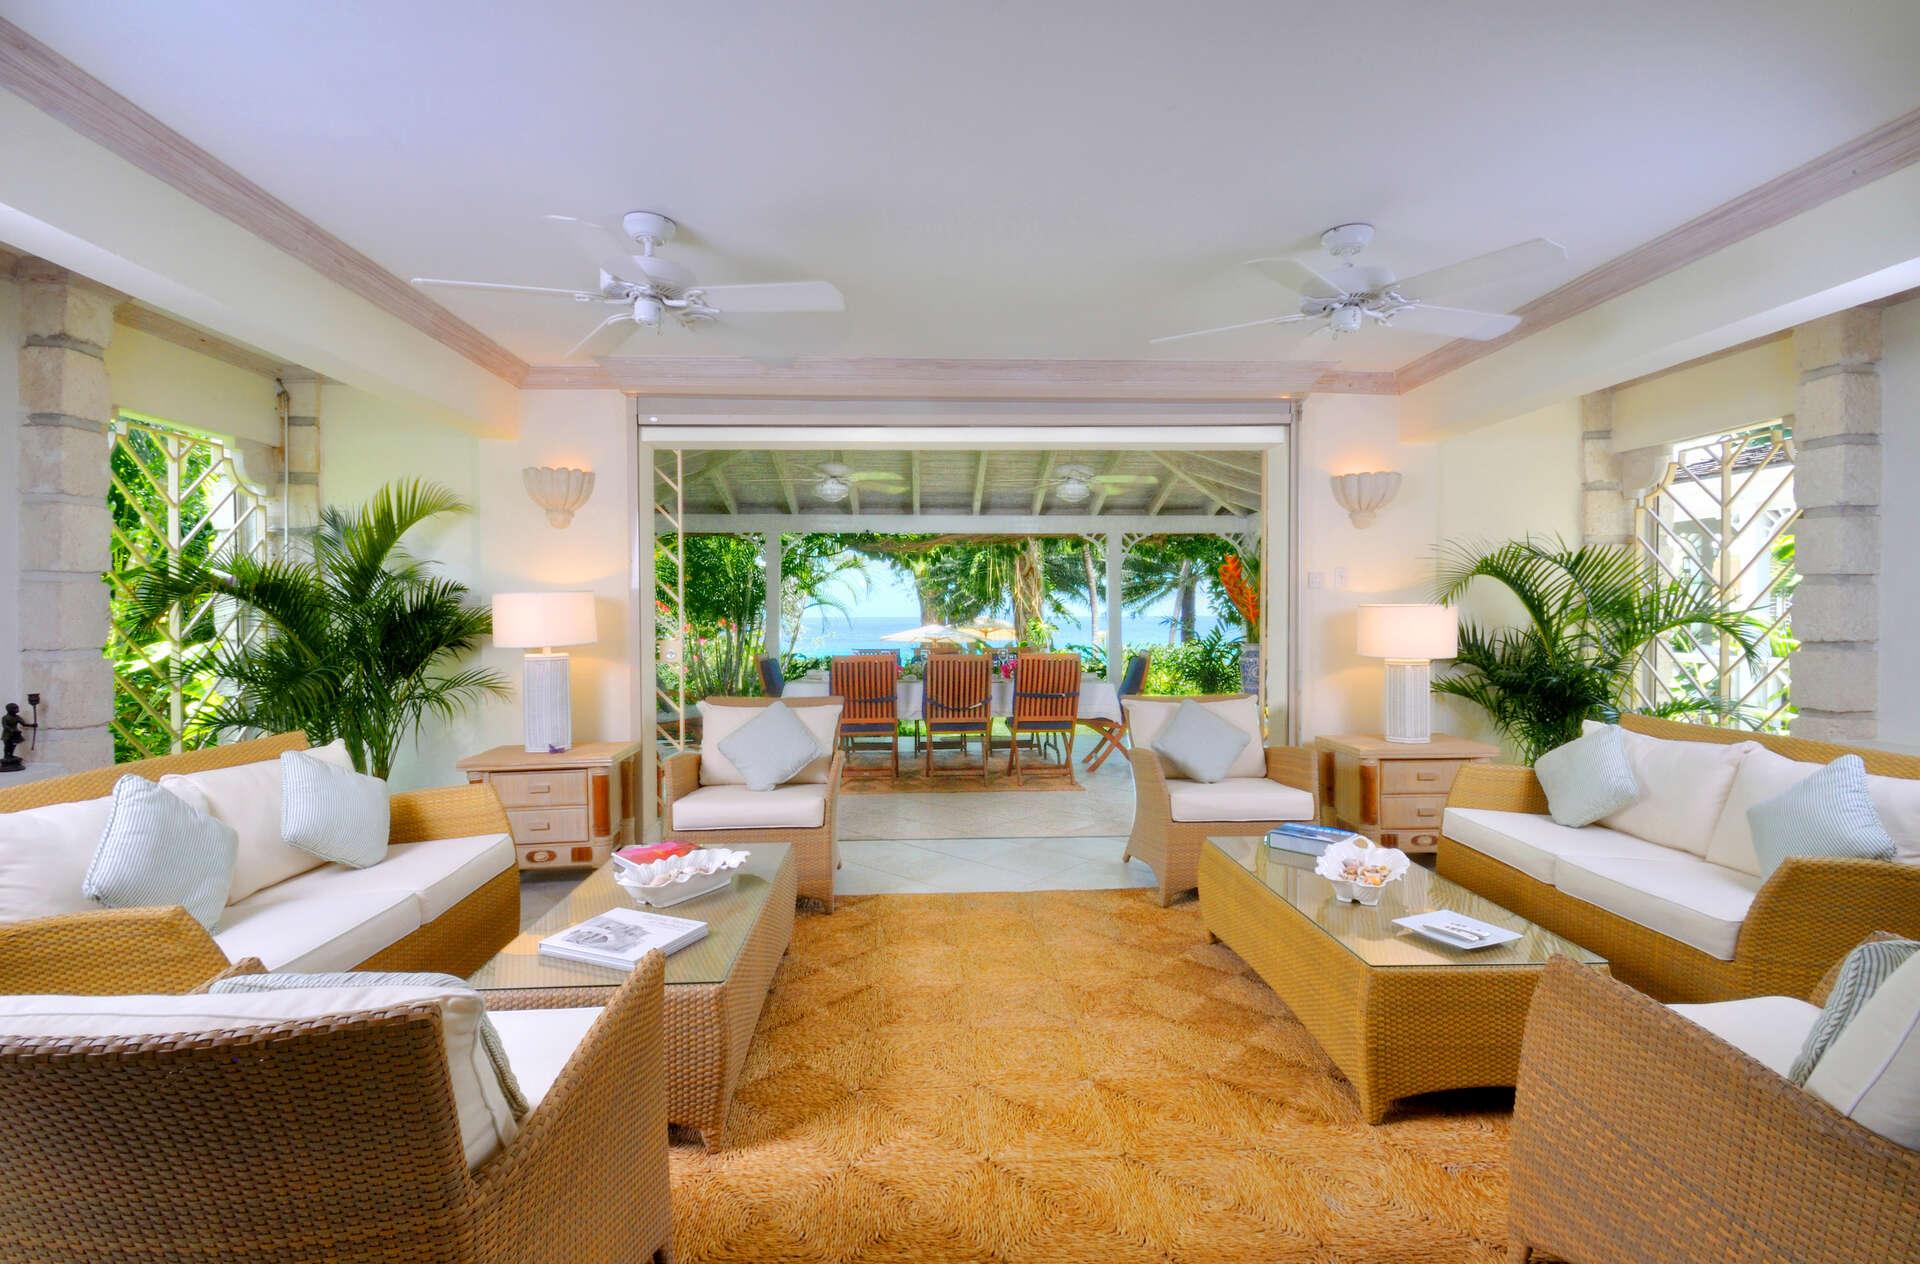 Luxury villa rentals caribbean - Barbados - St james - Derricks - Secret Cove 4 - Image 1/10